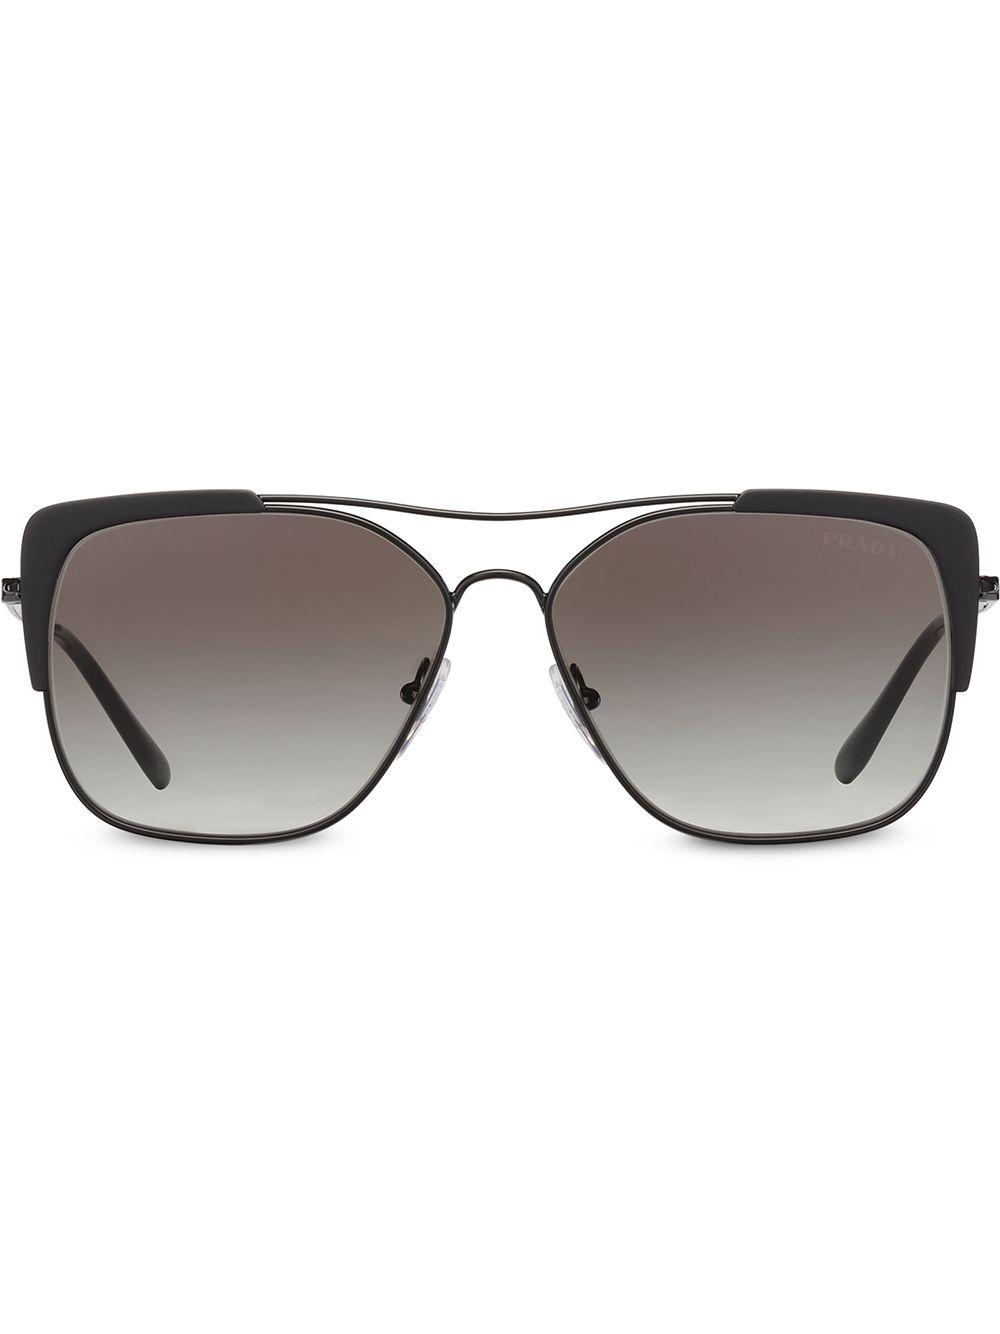 4dfc5a48fe0a7 Cheap Prada Sunglasses Aviator